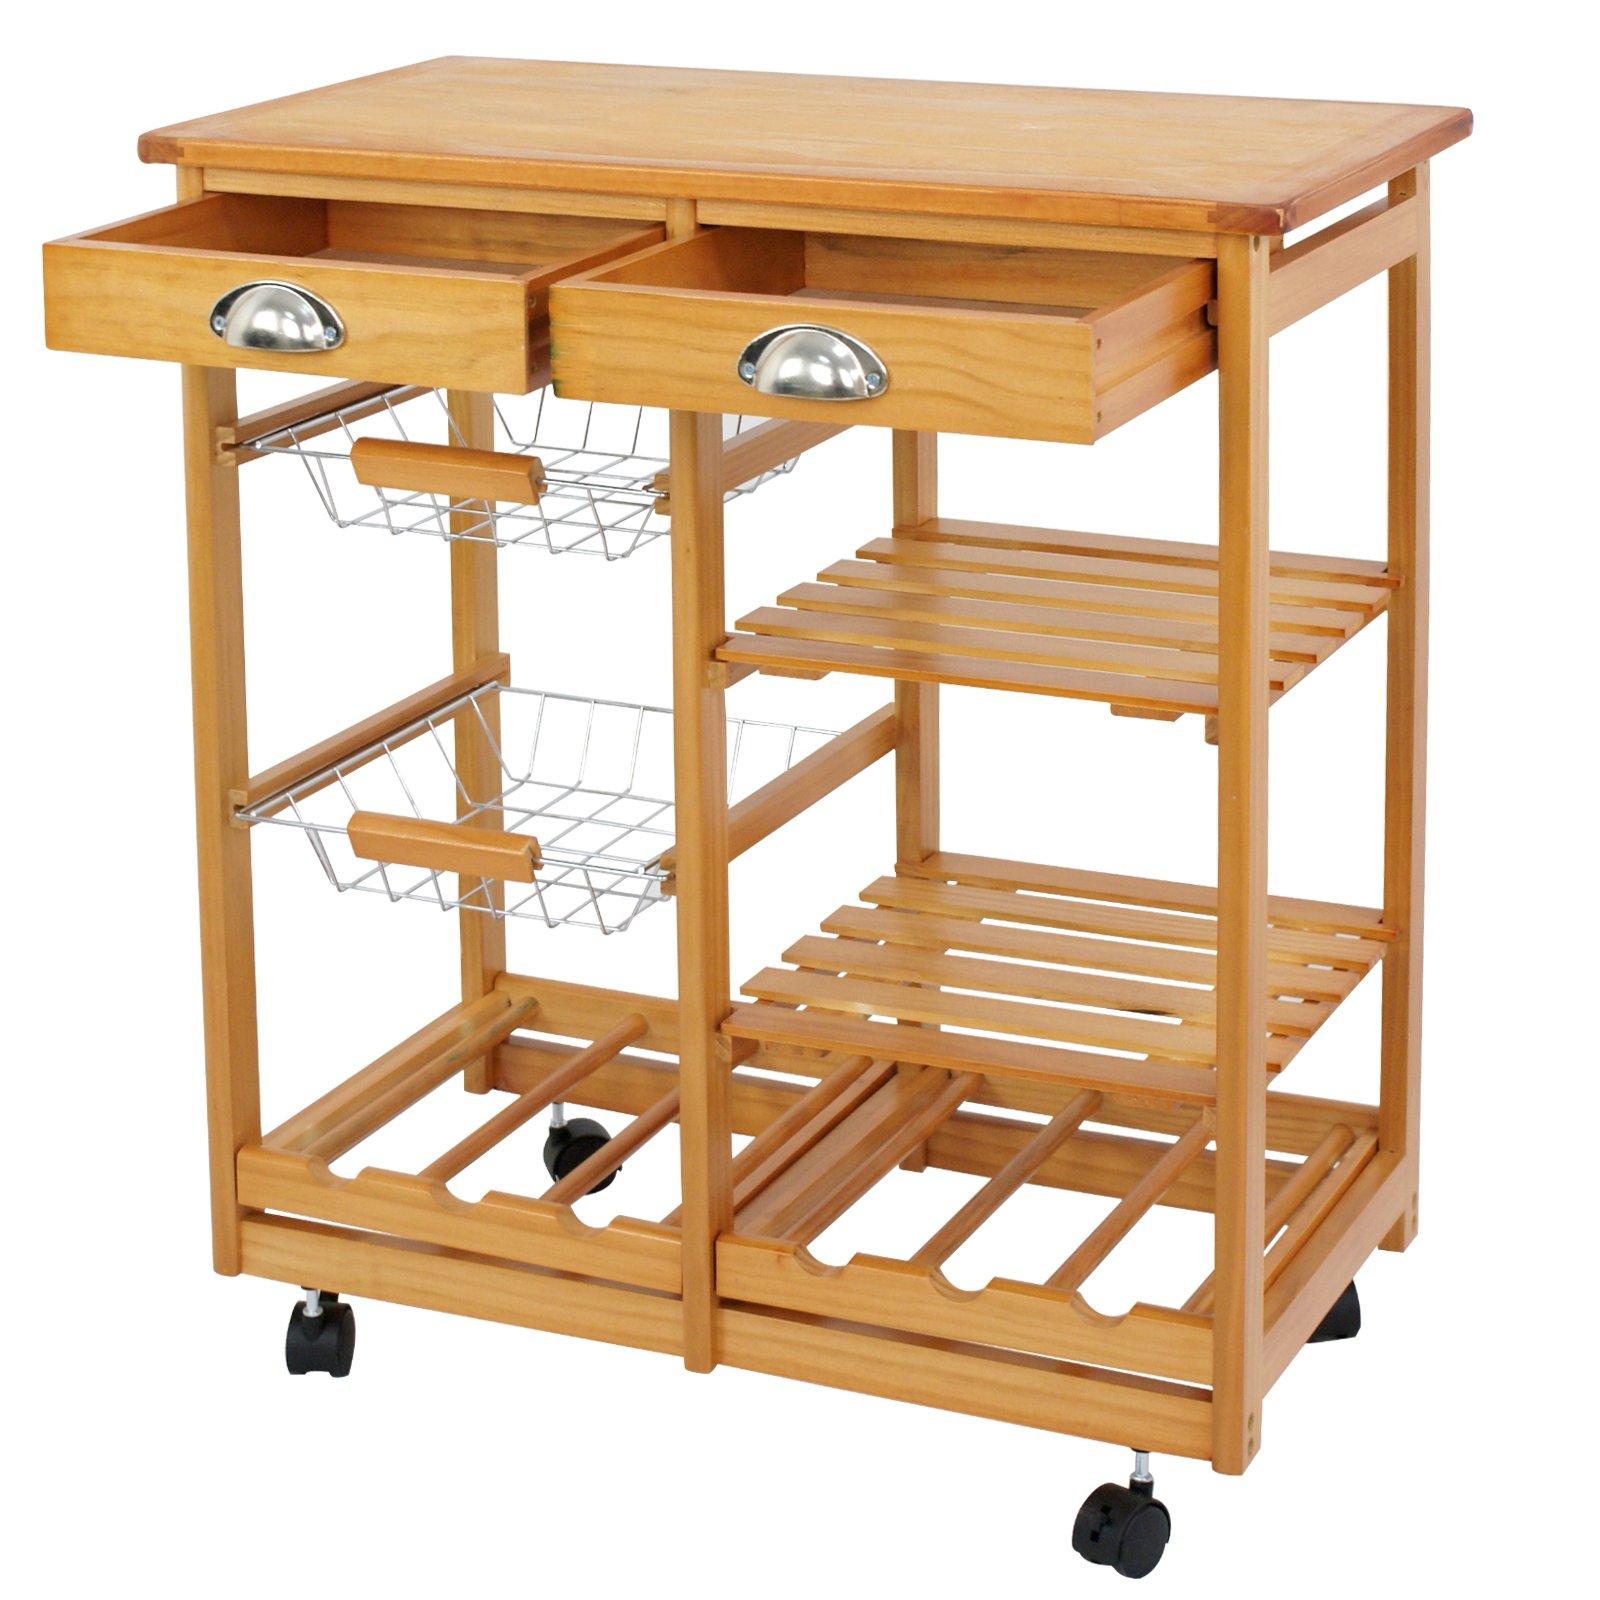 Nova Microdermabrasion Rolling Wood Kitchen Island Storage Trolley Utility Cart Rack w/Storage Drawers/Baskets Dining Stand w/Wheels Countertop (Wood)